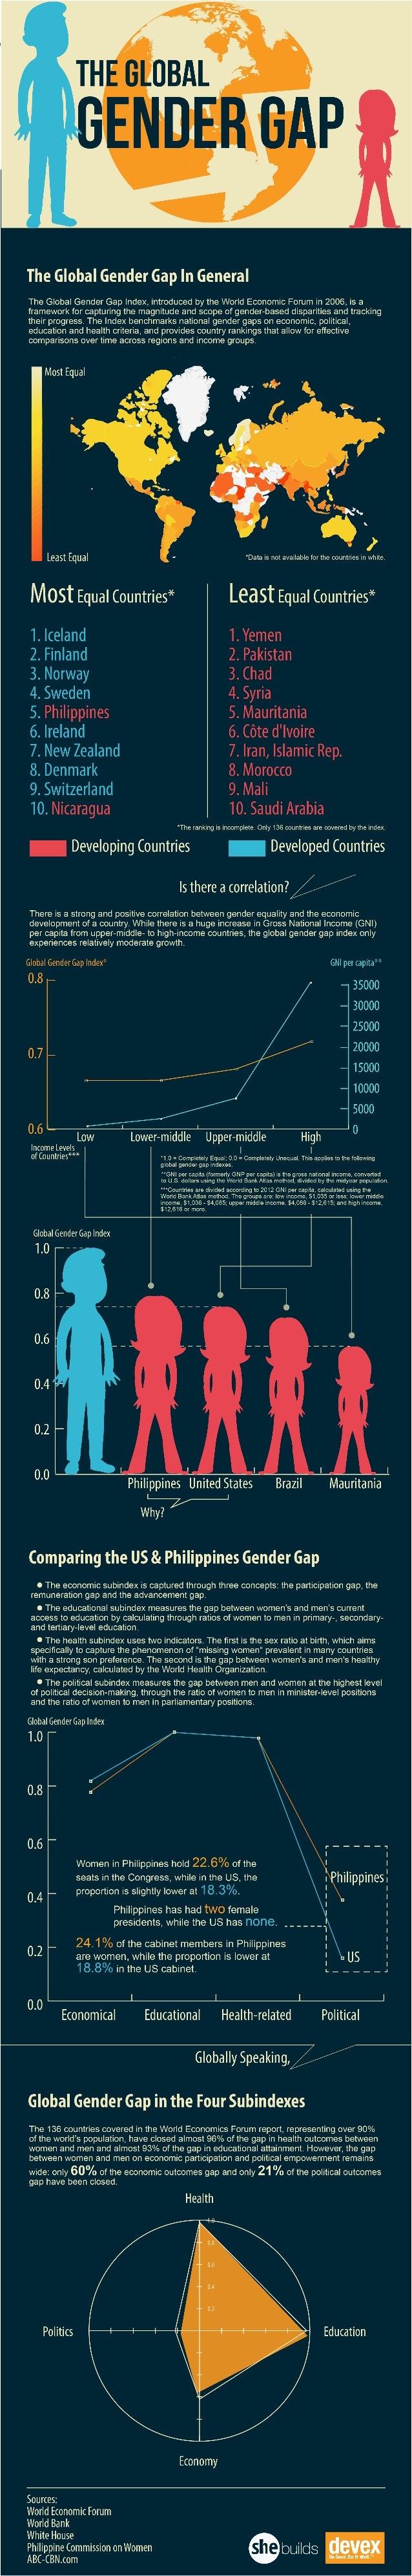 The Global Gender Gap